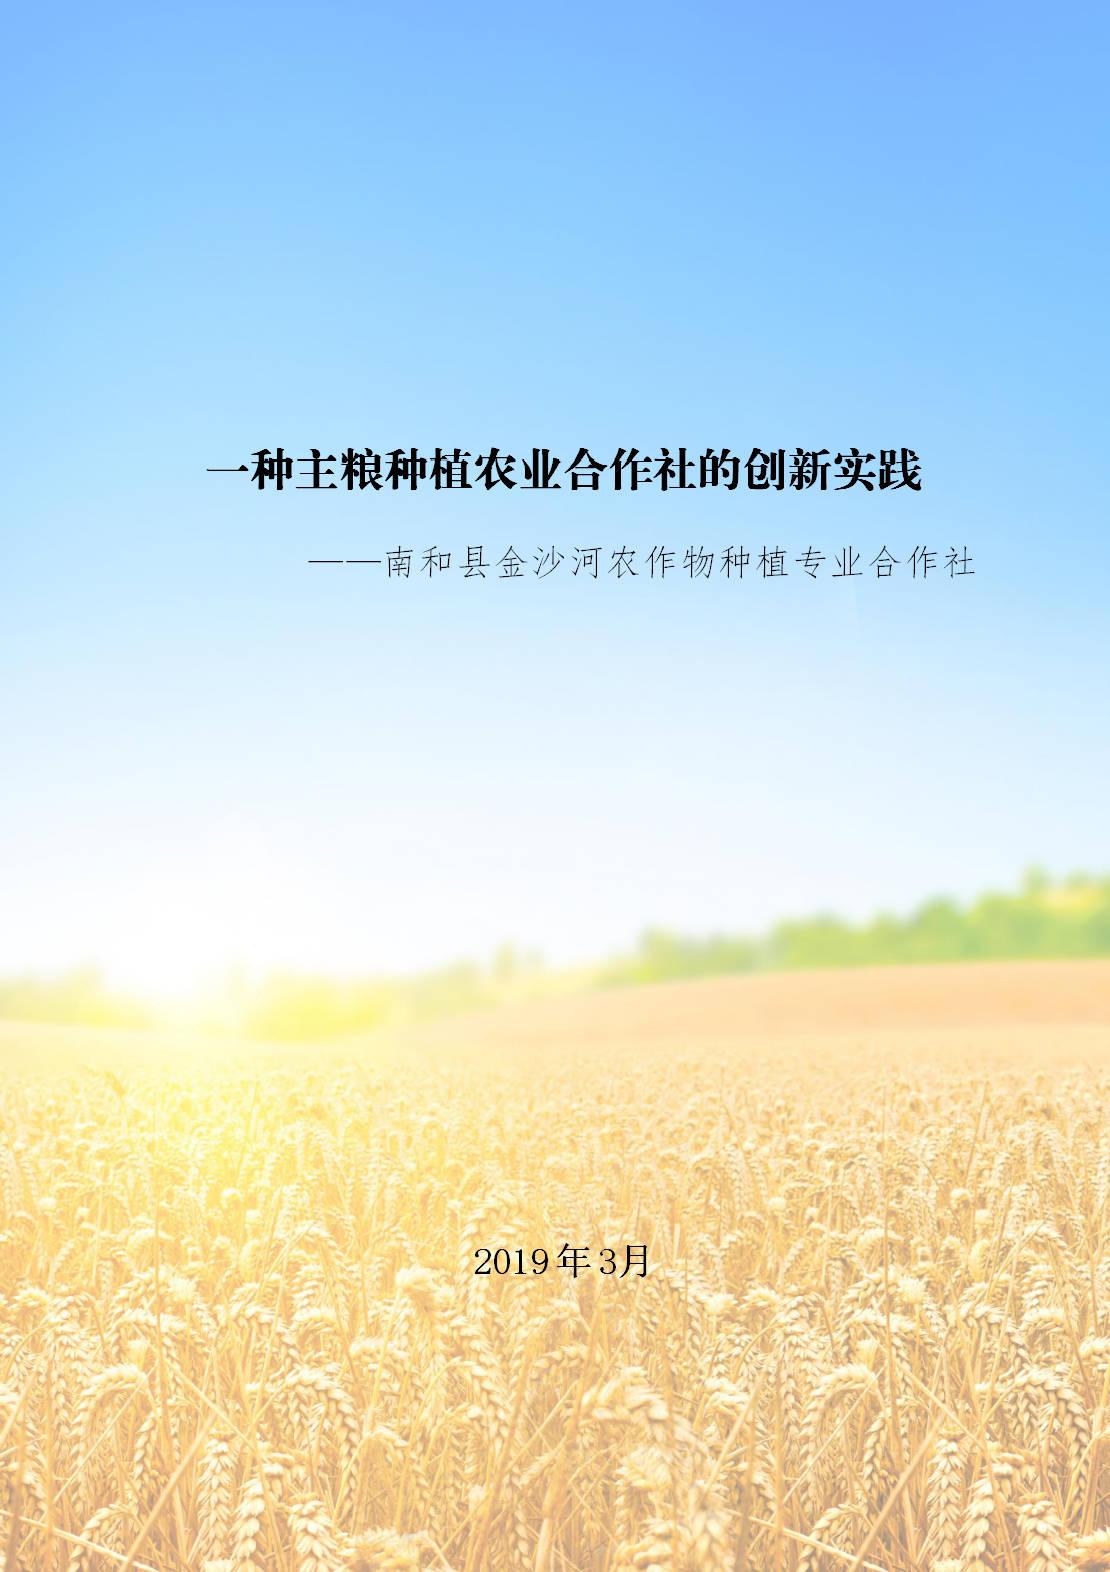 2020-09-30_094859